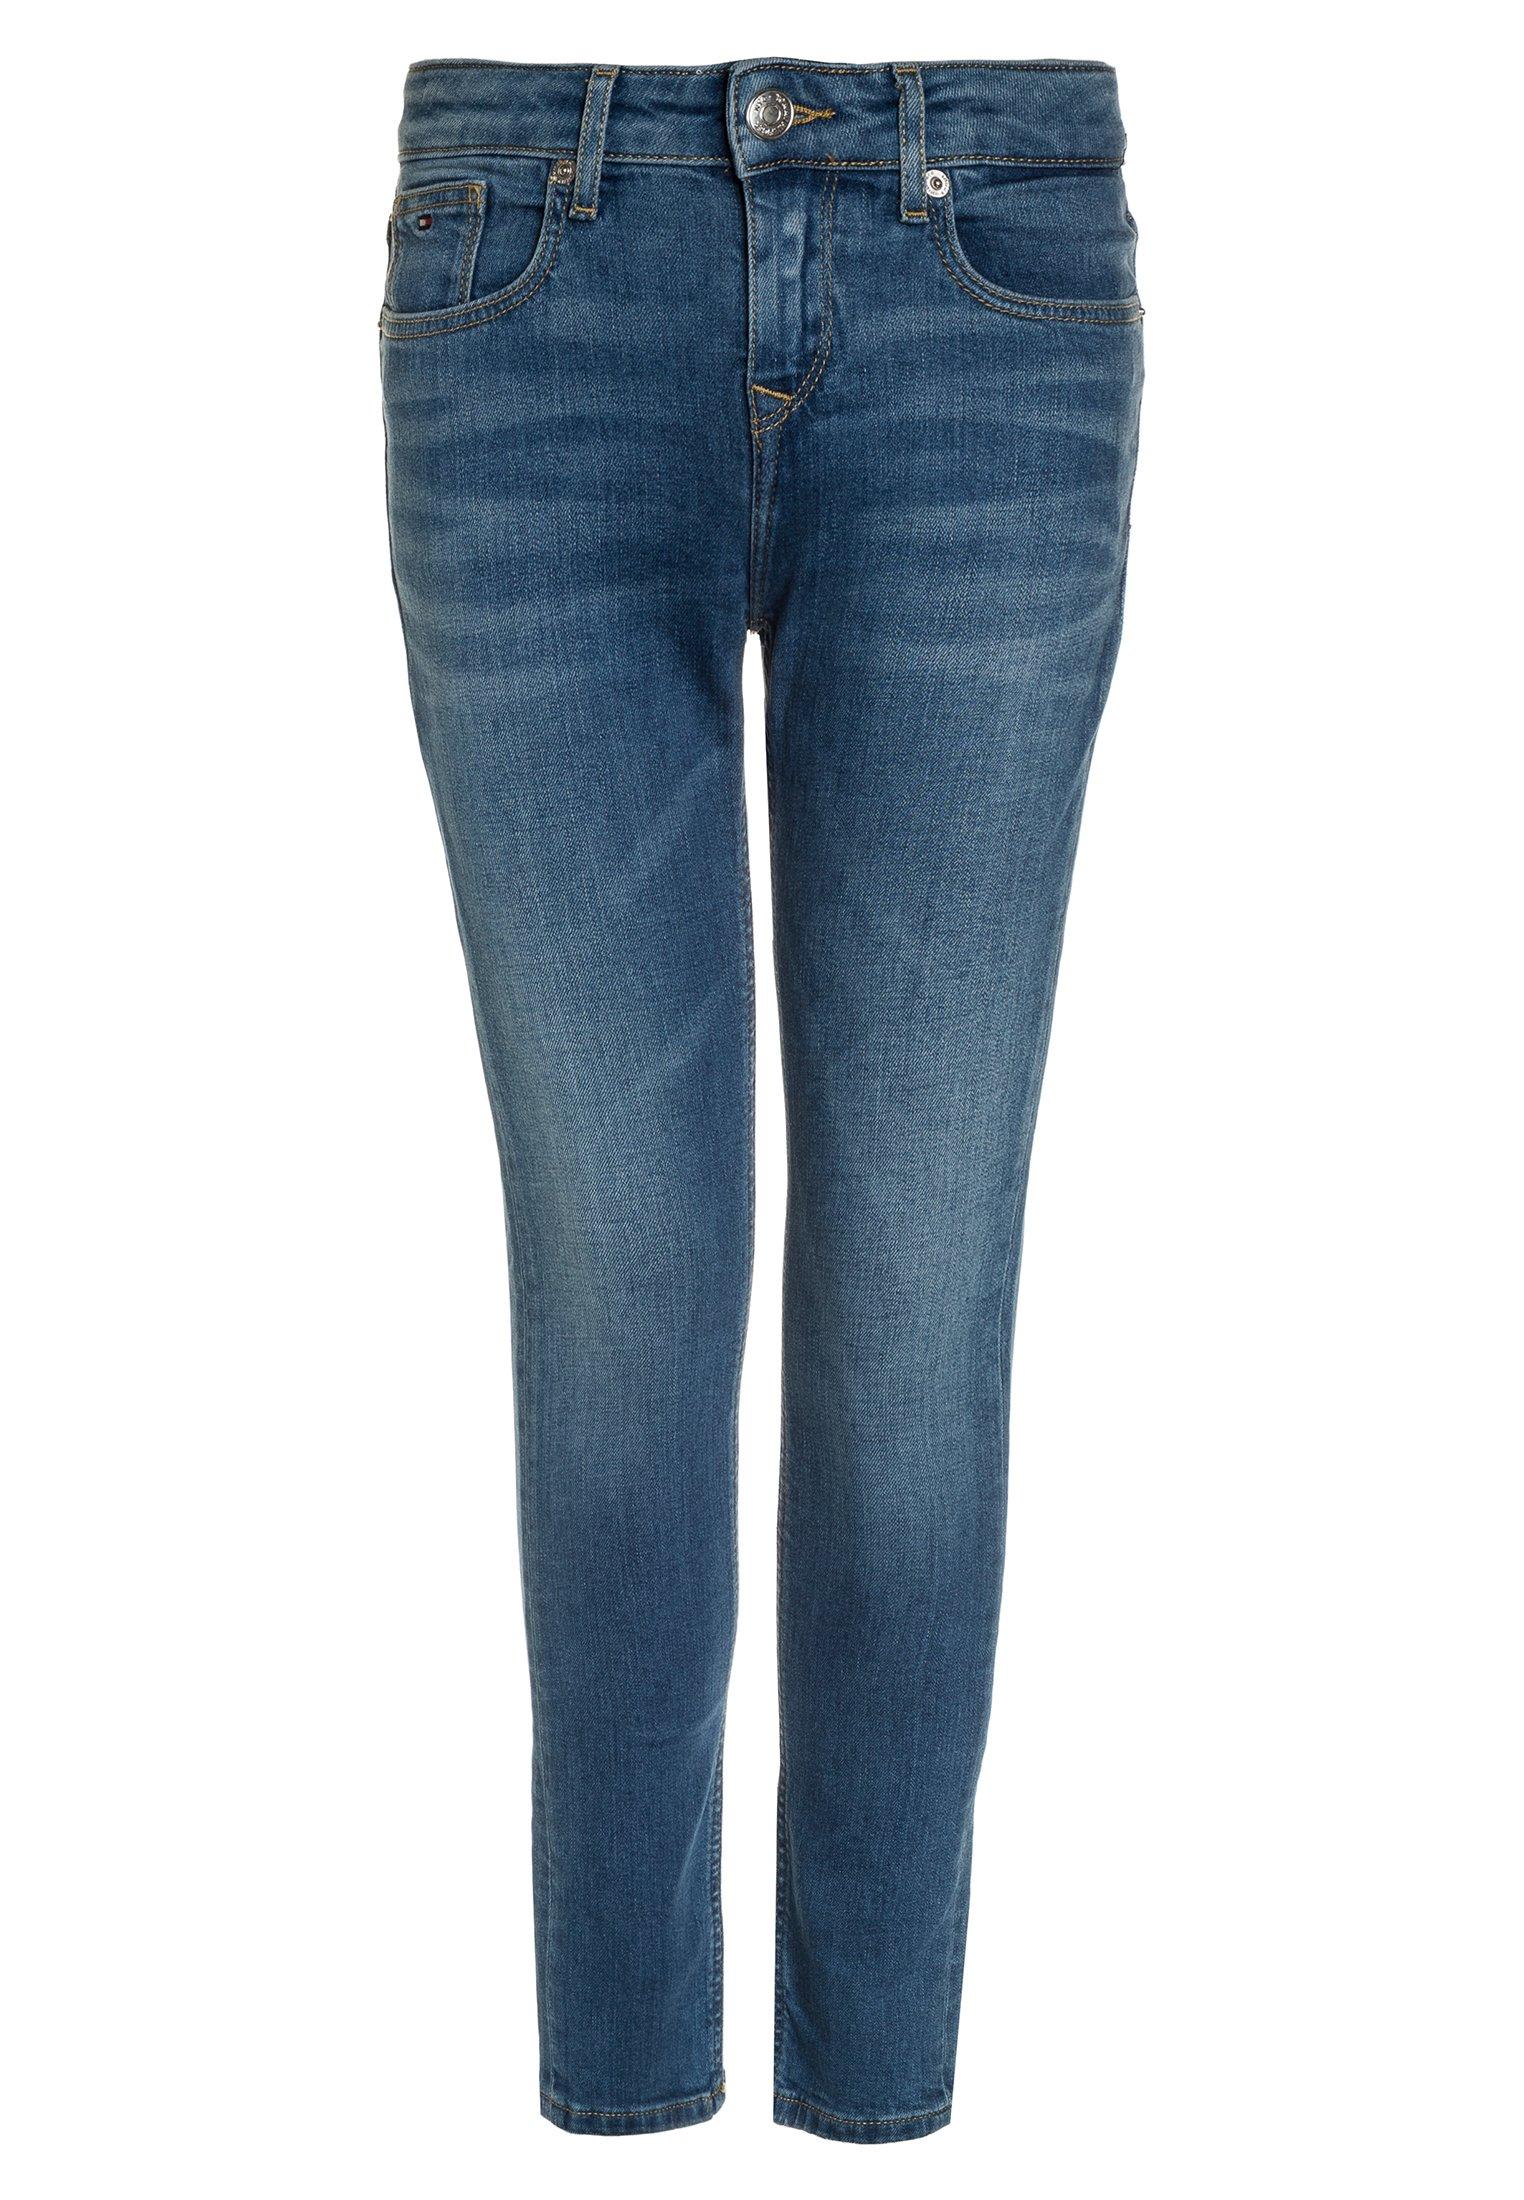 Kids GIRLS NORA  - Jeans Skinny Fit - new york mid